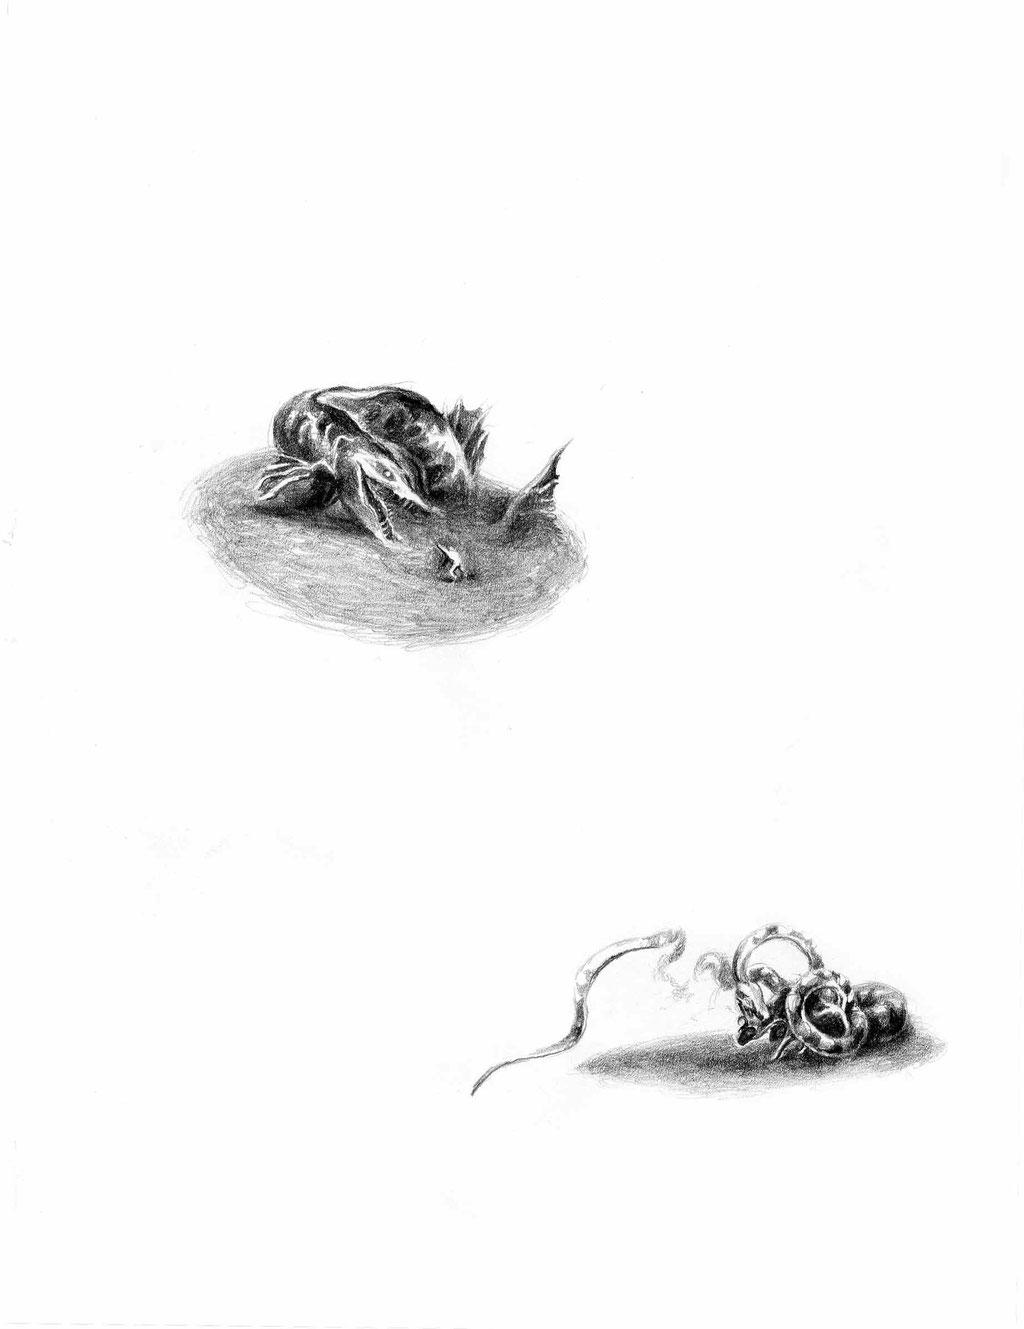 Matthias-Wyss-Dschungel-Erstes-Buch-2004-2005-Pencil-On-Paper-22x29Cm